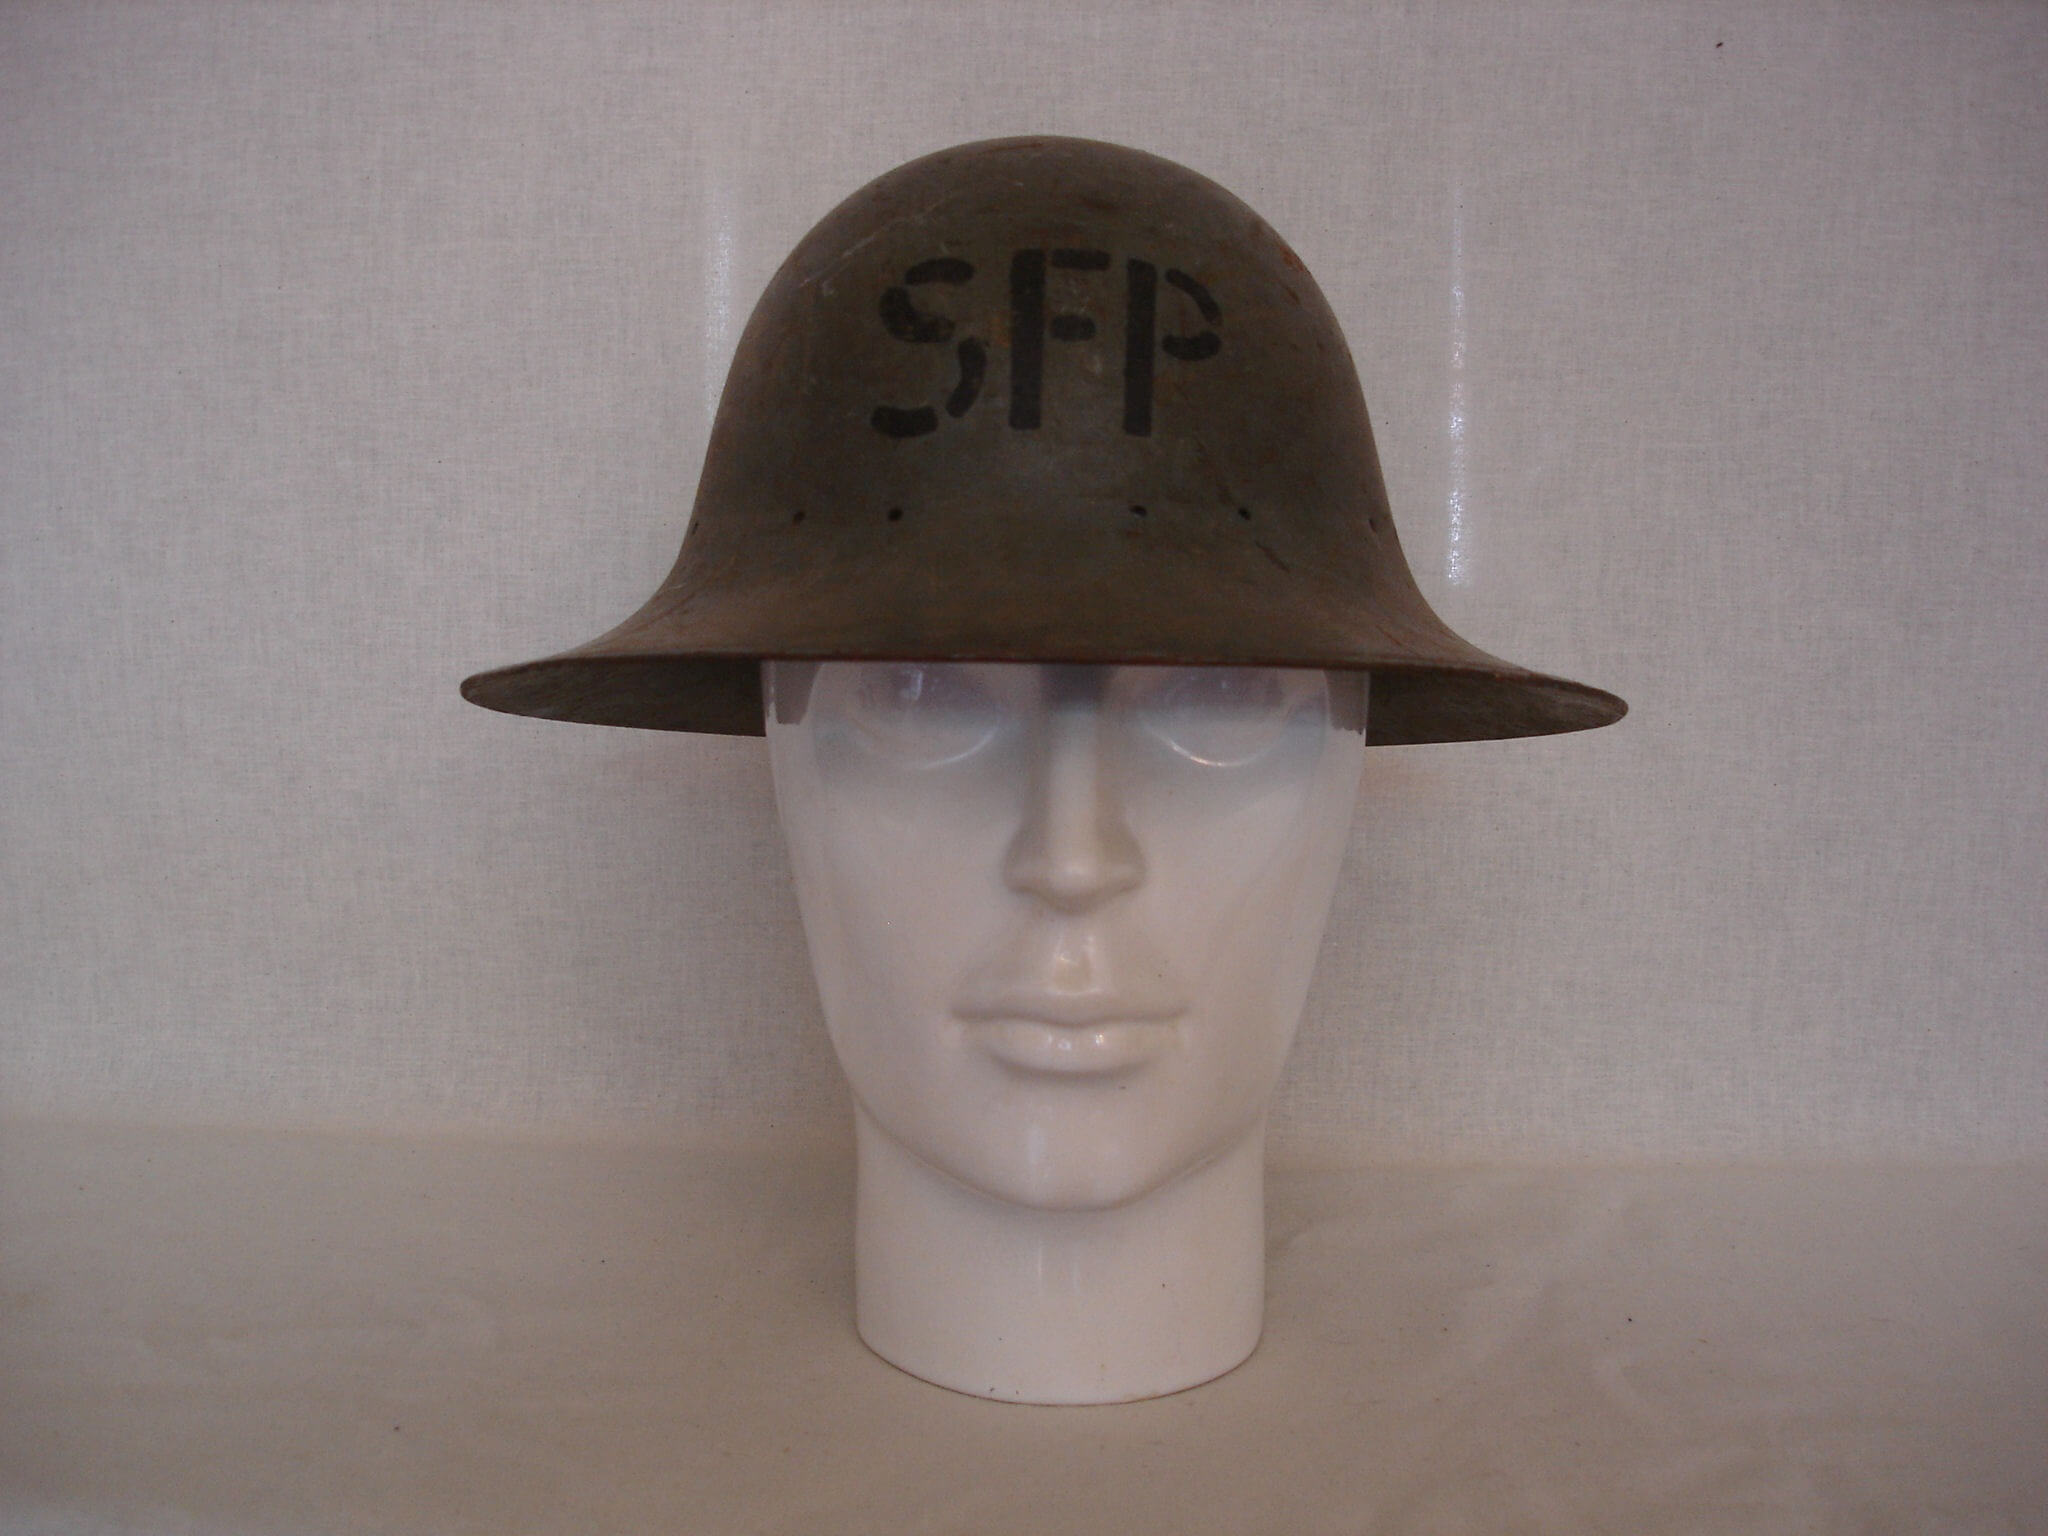 Engelse Helm Safety Fire Patrol uit de tweede wereldoorlog wo2 ww2